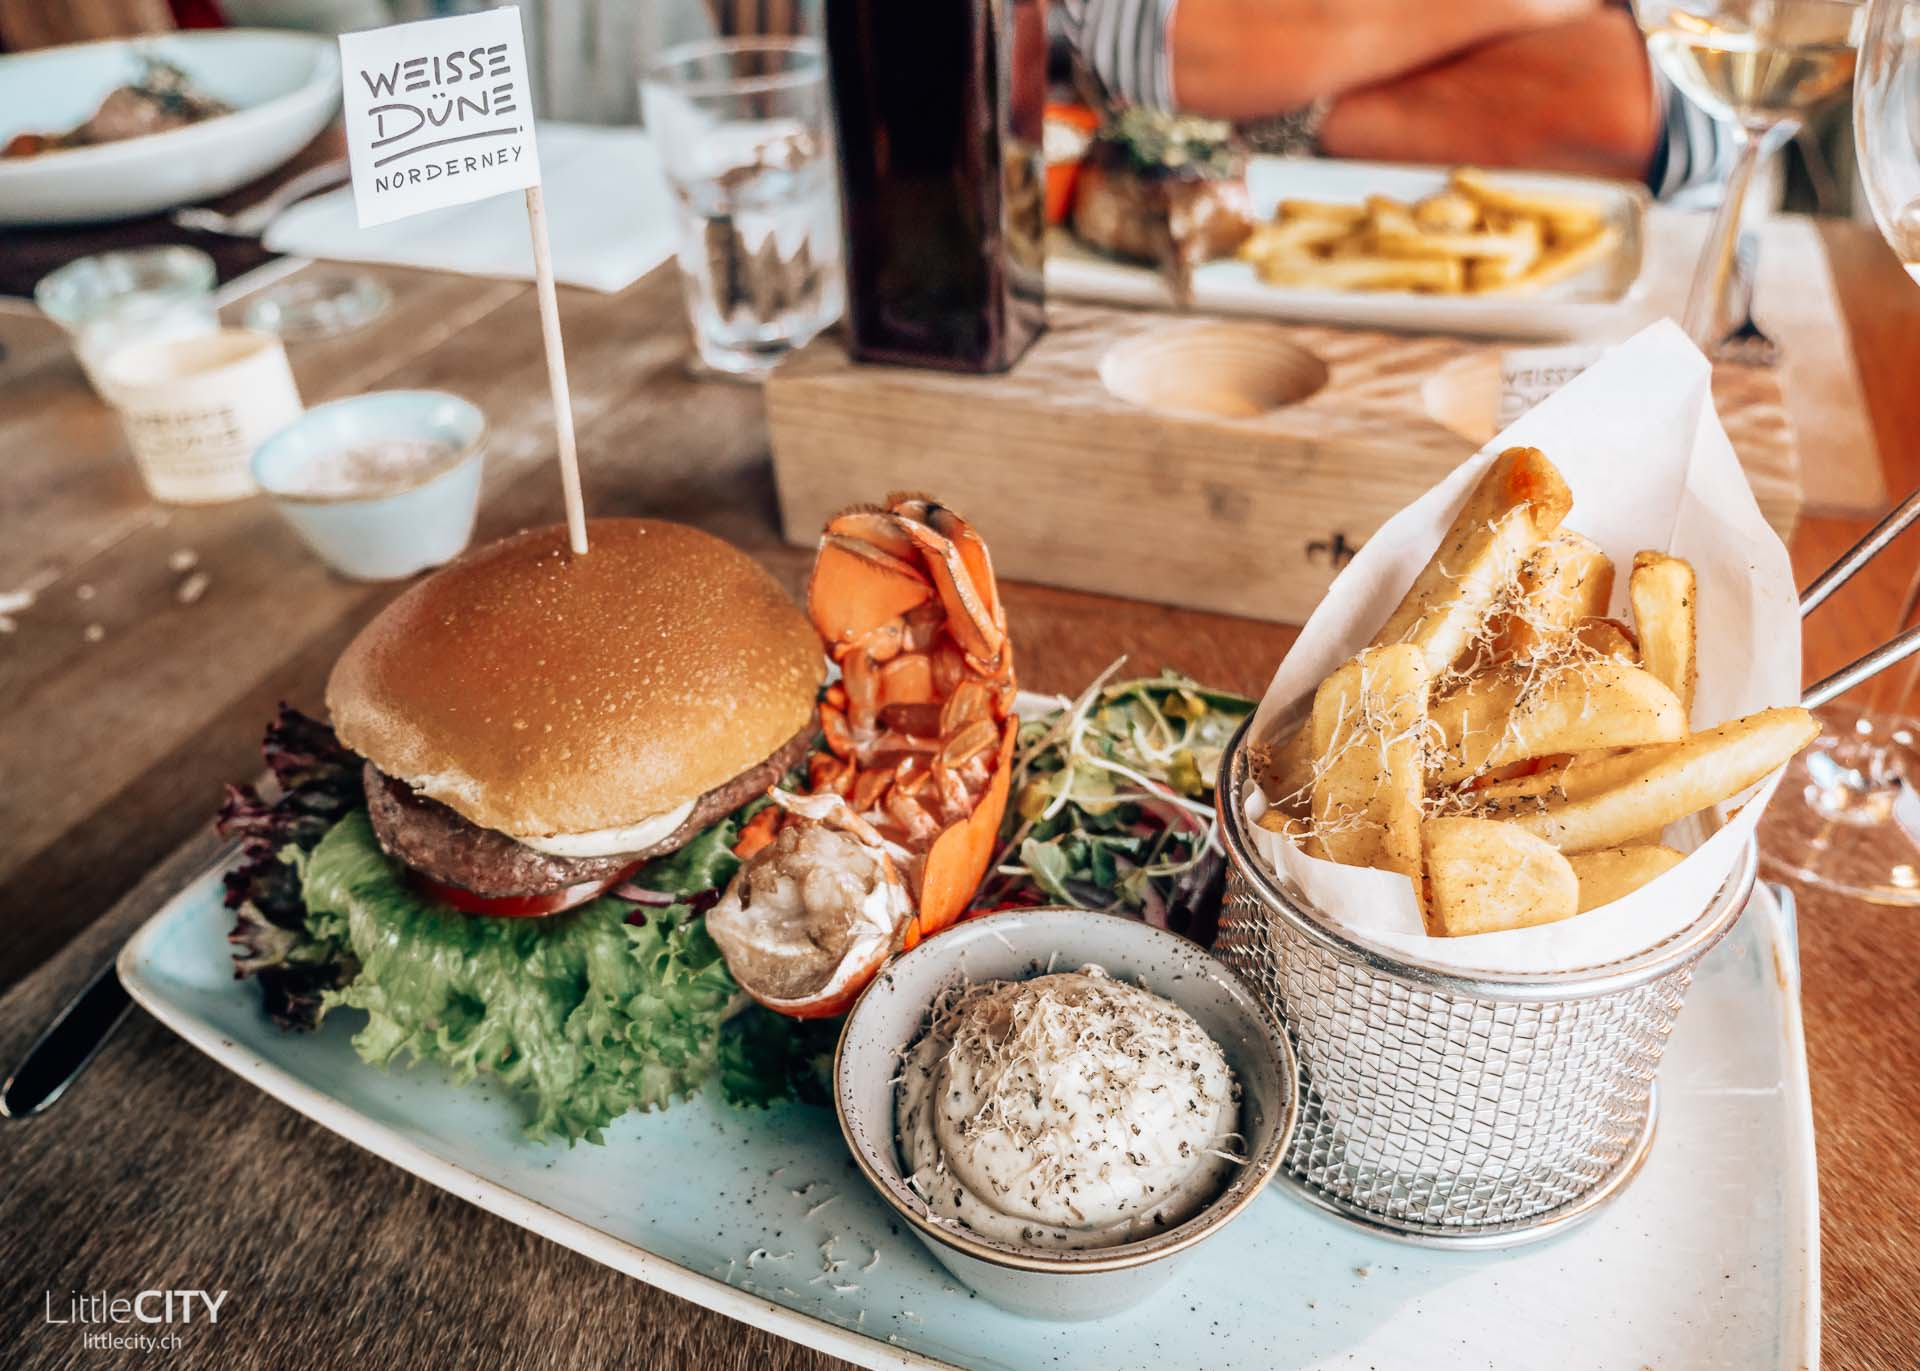 Norderney Weisse Düne Restaurant Burger